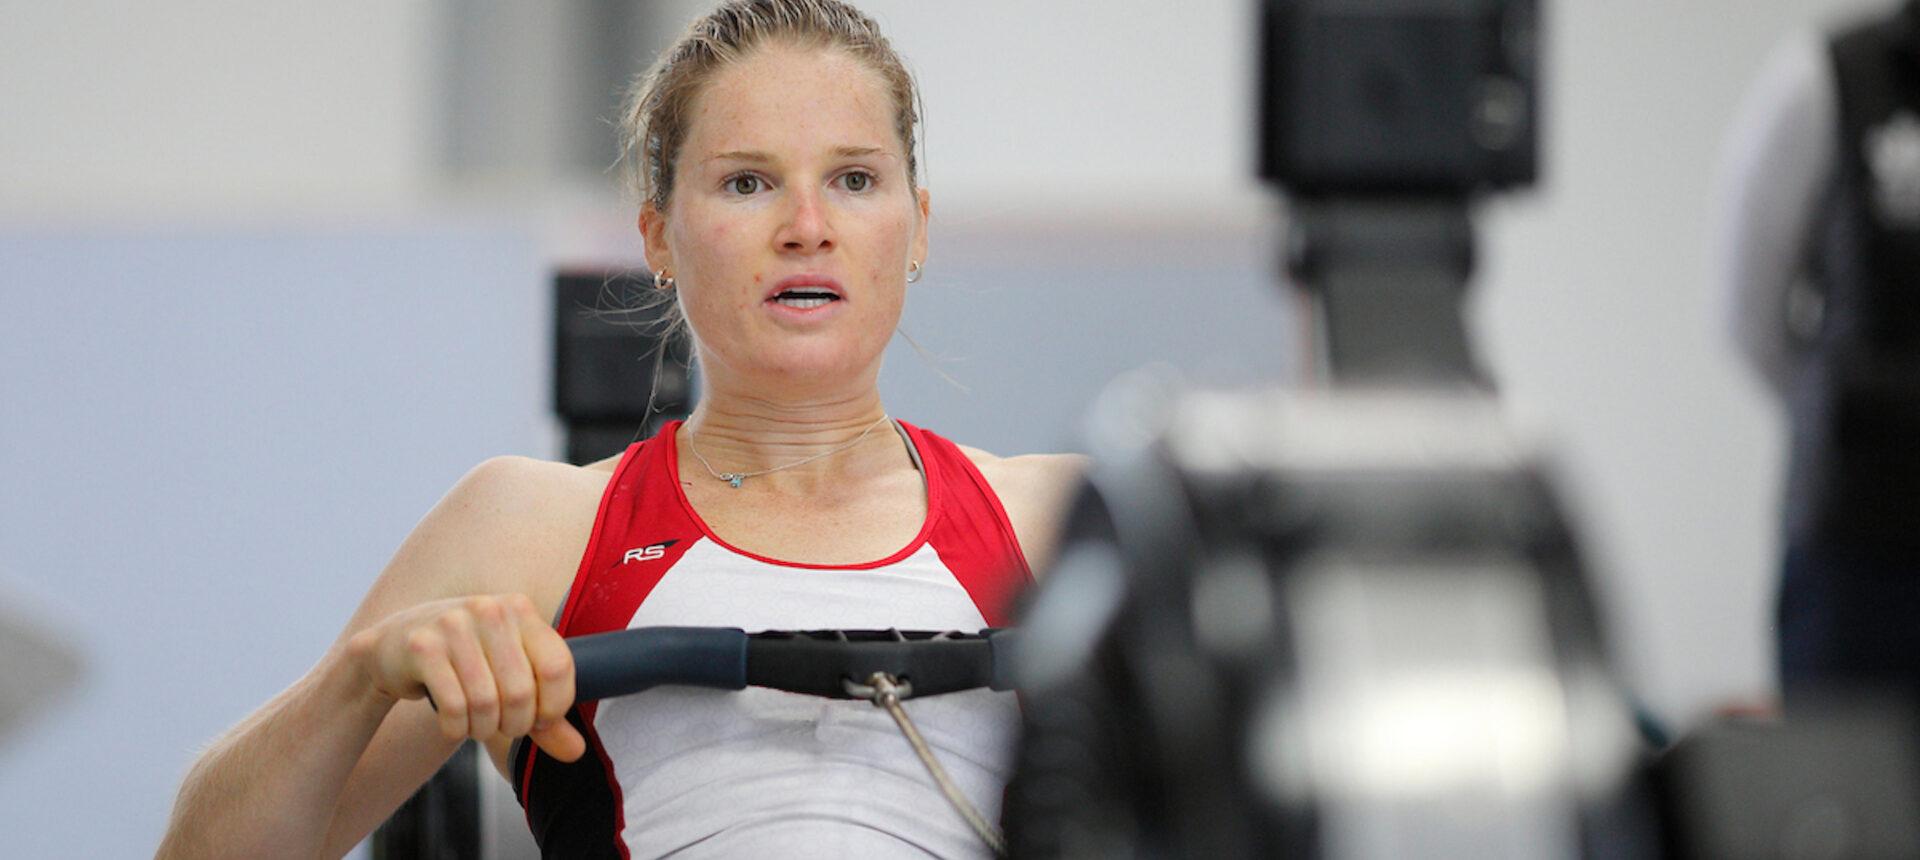 New dates set for Canadian Indoor Rowing Challenge